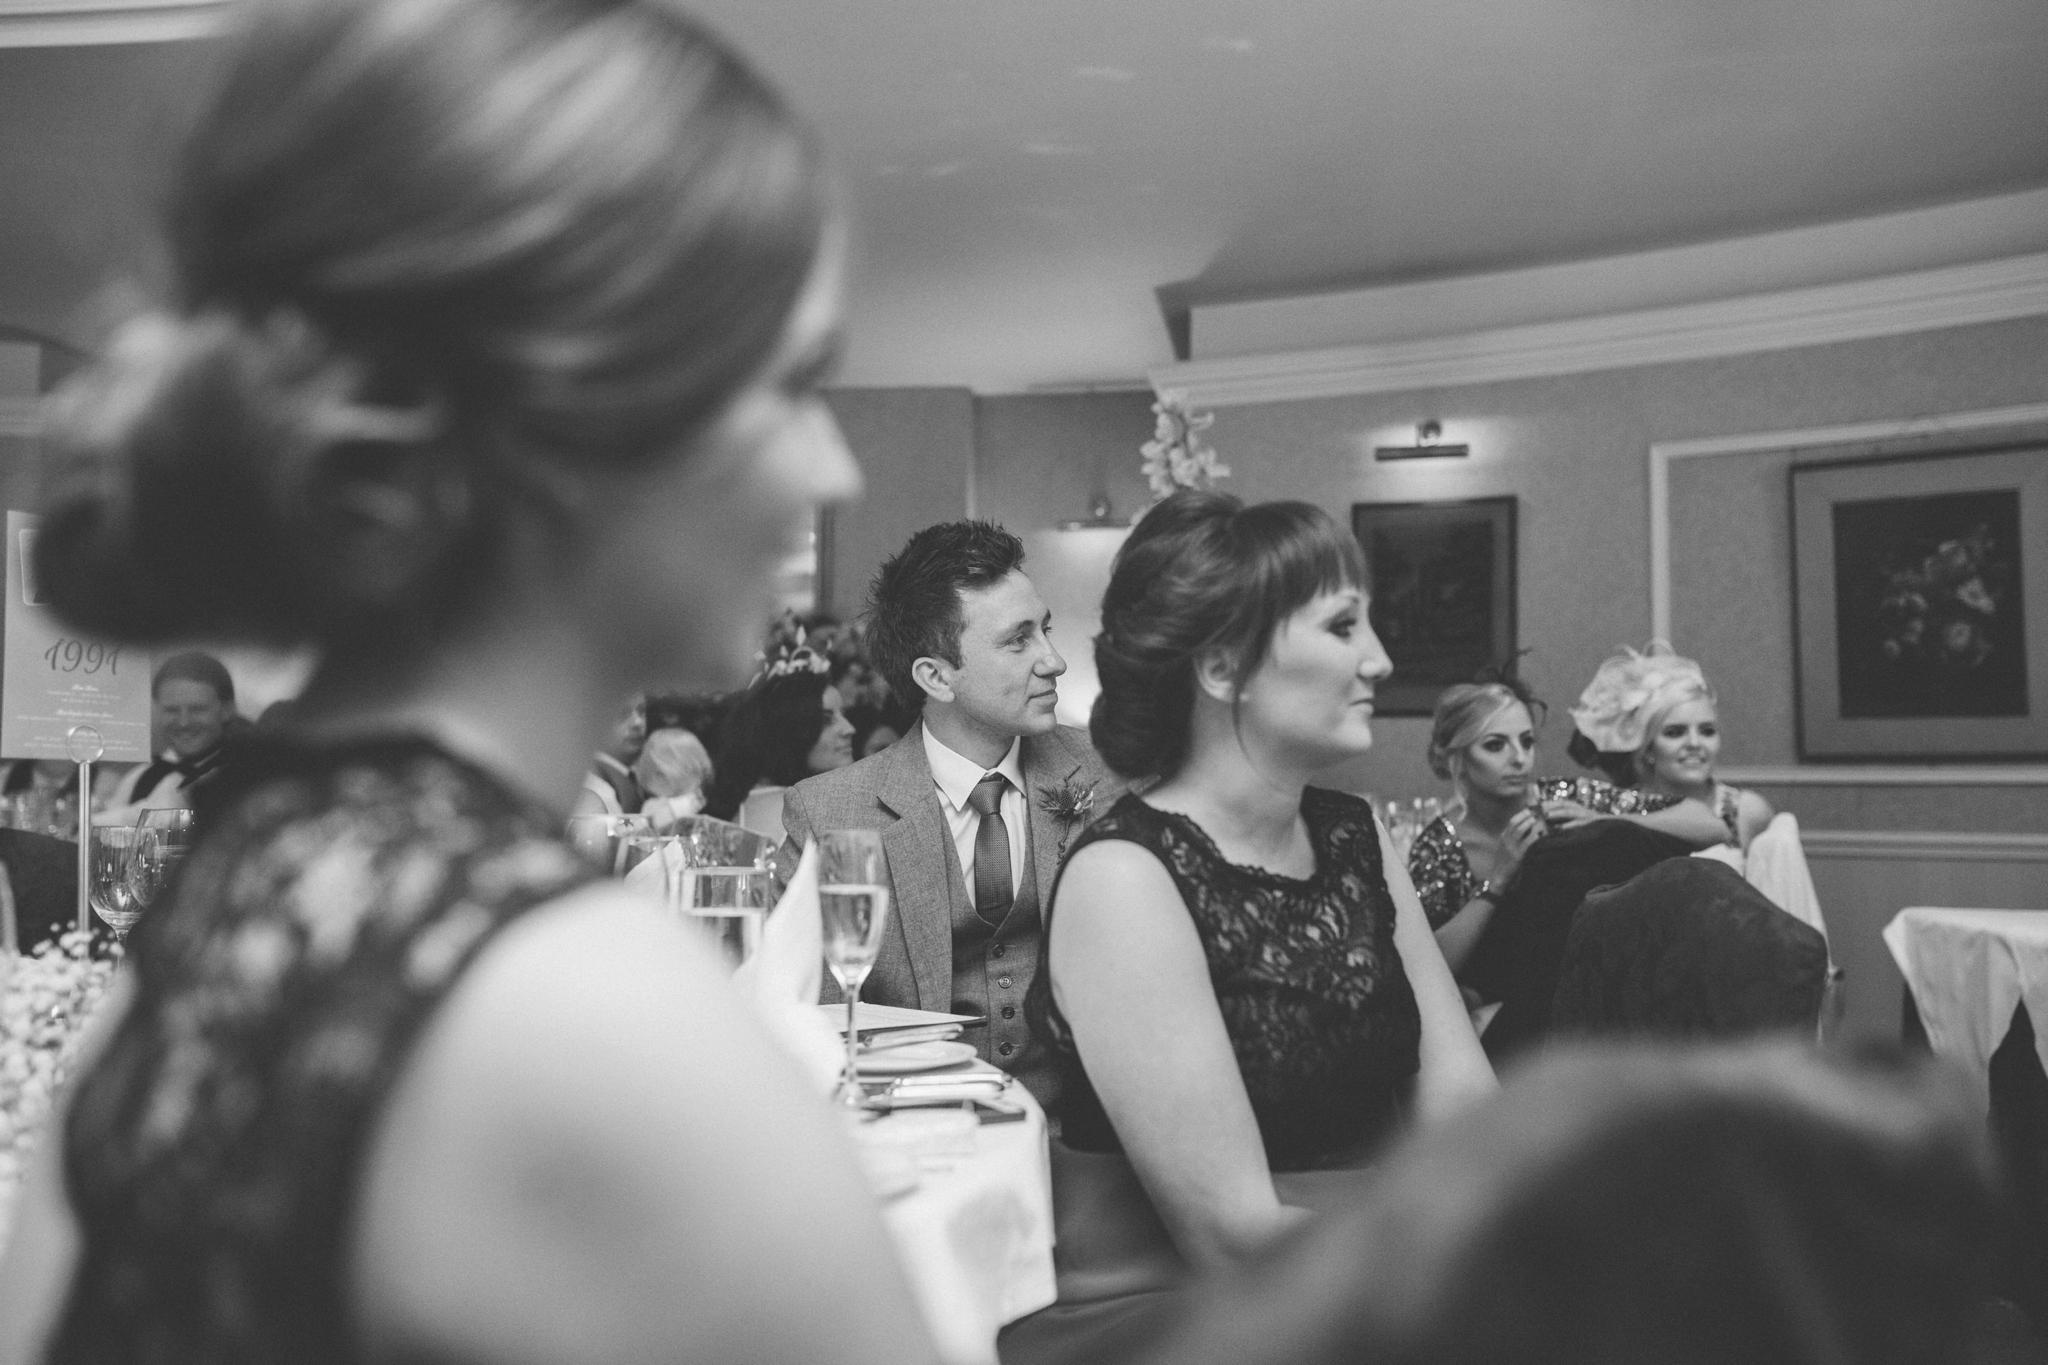 Suzanne_li_photography_Roman_camp_wedding_0033.jpg